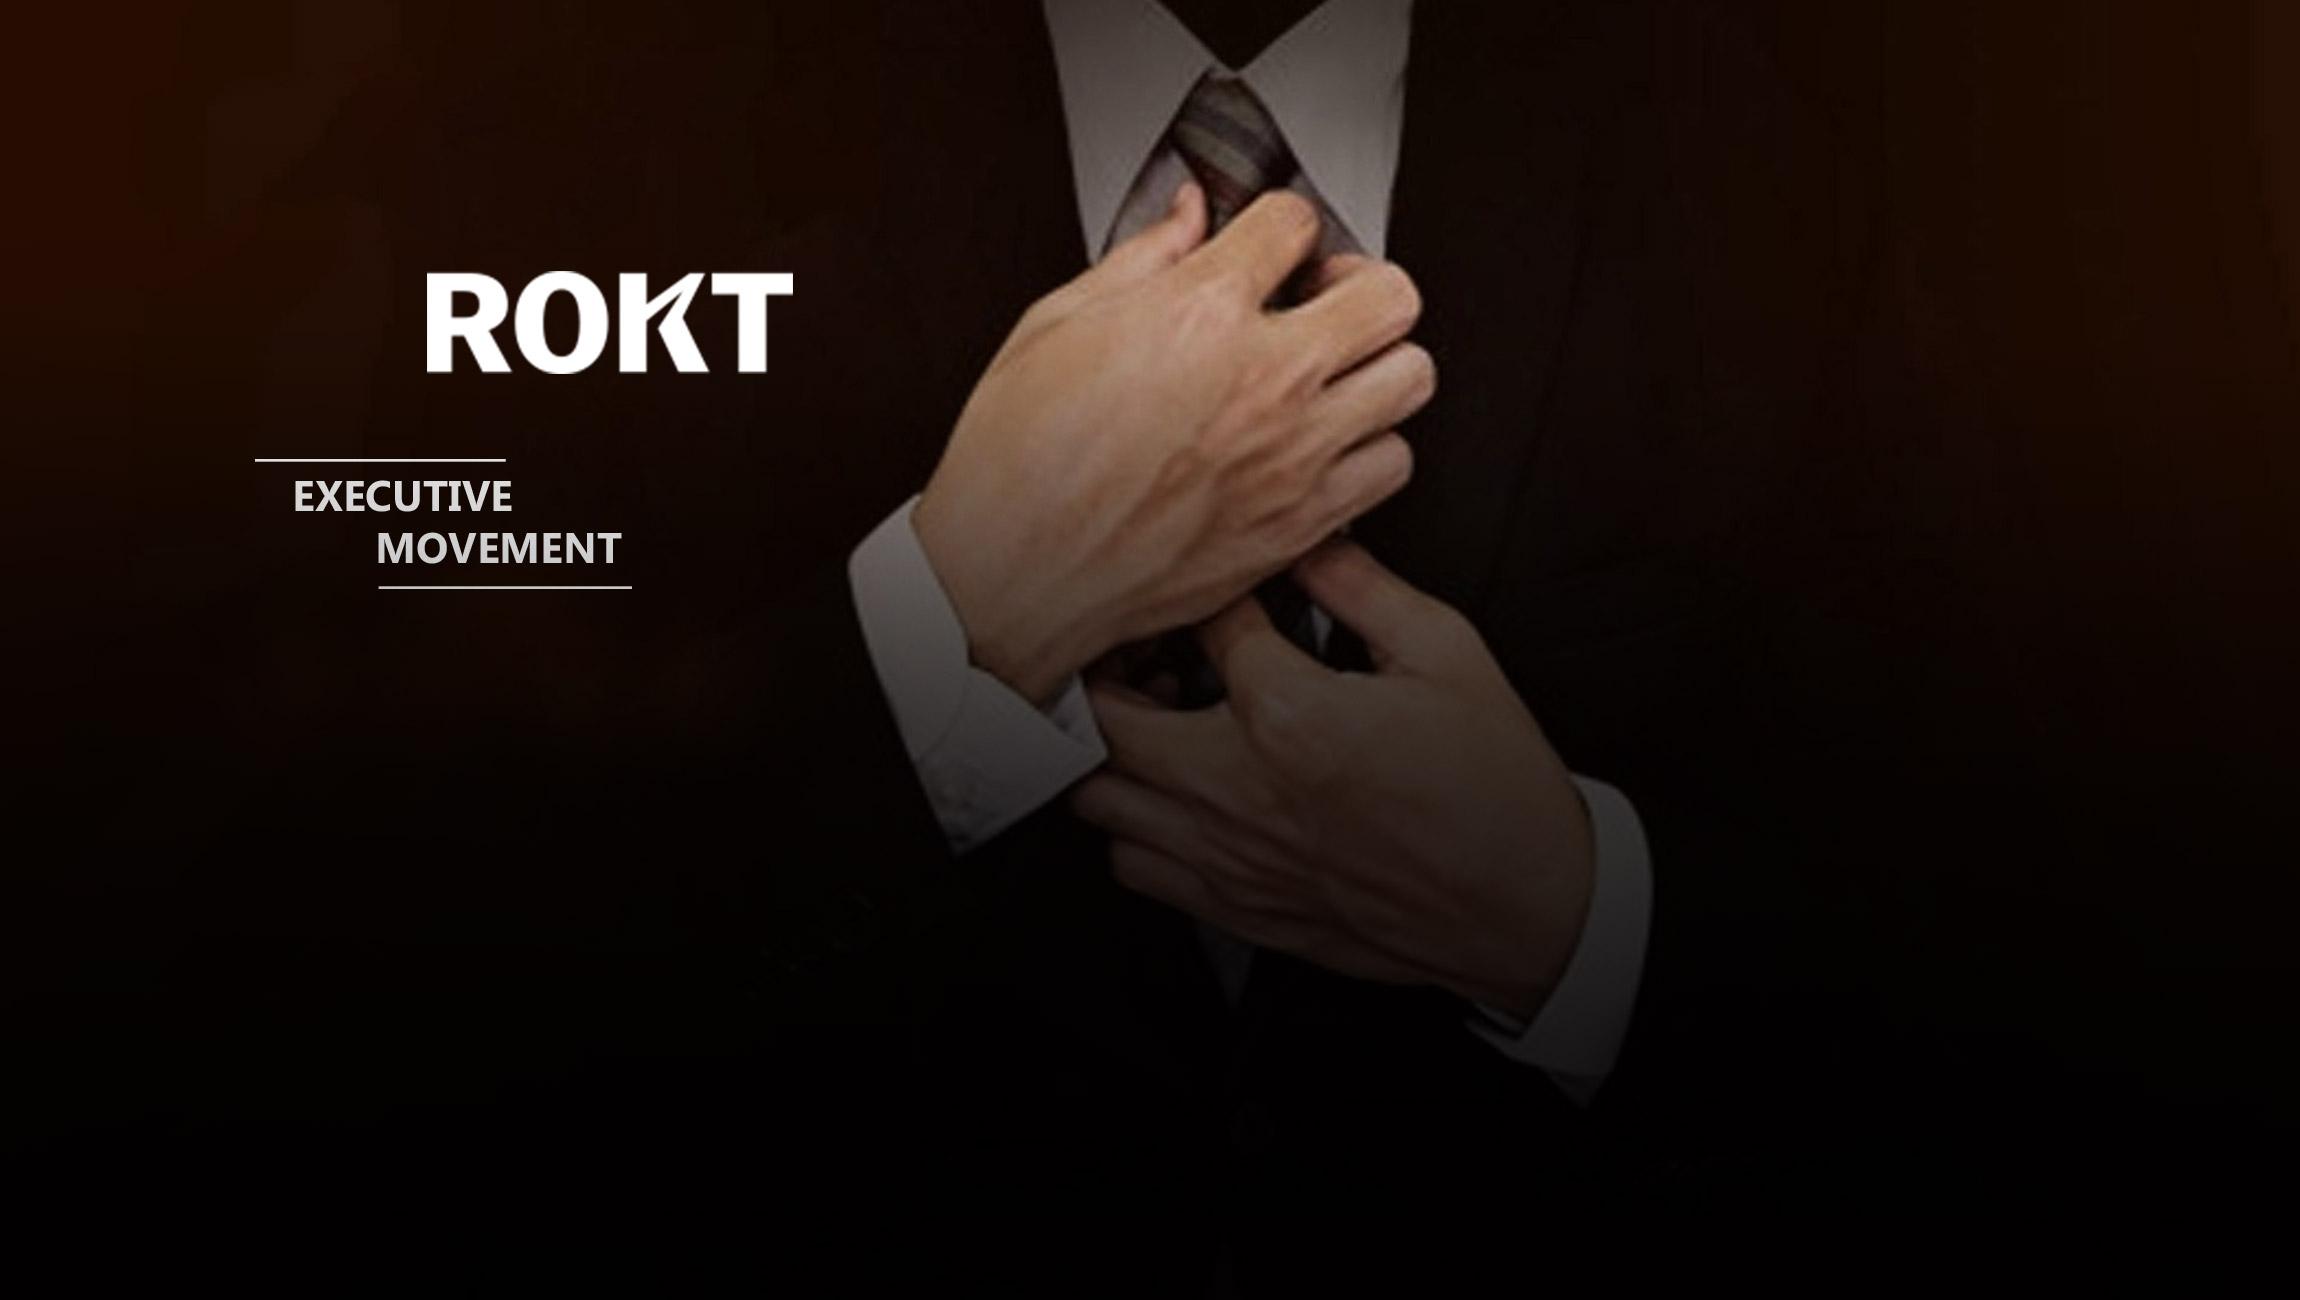 Braze Co-Founder & CEO, Bill Magnuson joins Rokt Board of Directors